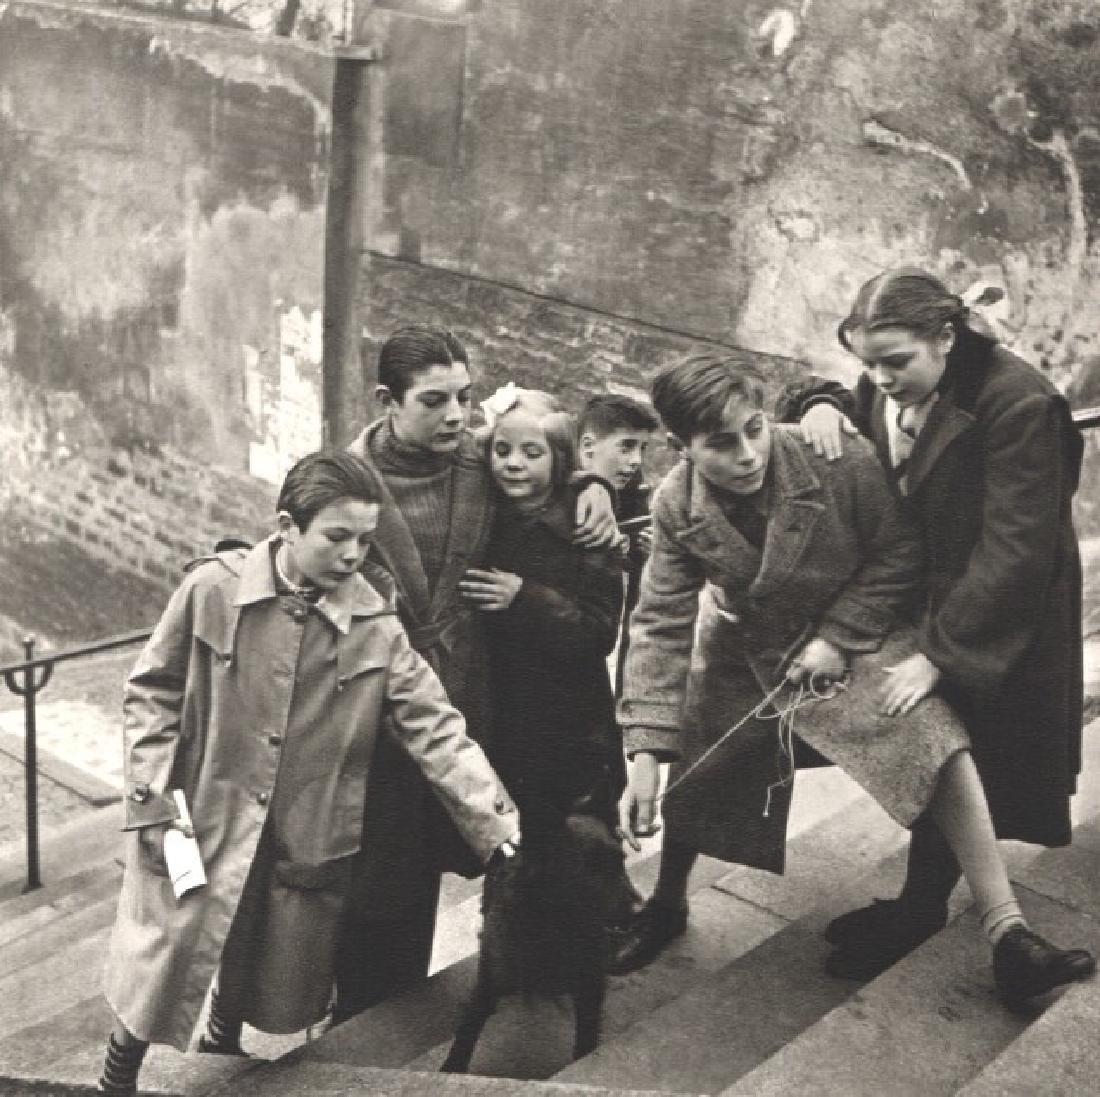 EDOUARD BOUBAT - Paris, 1949, Montmartre